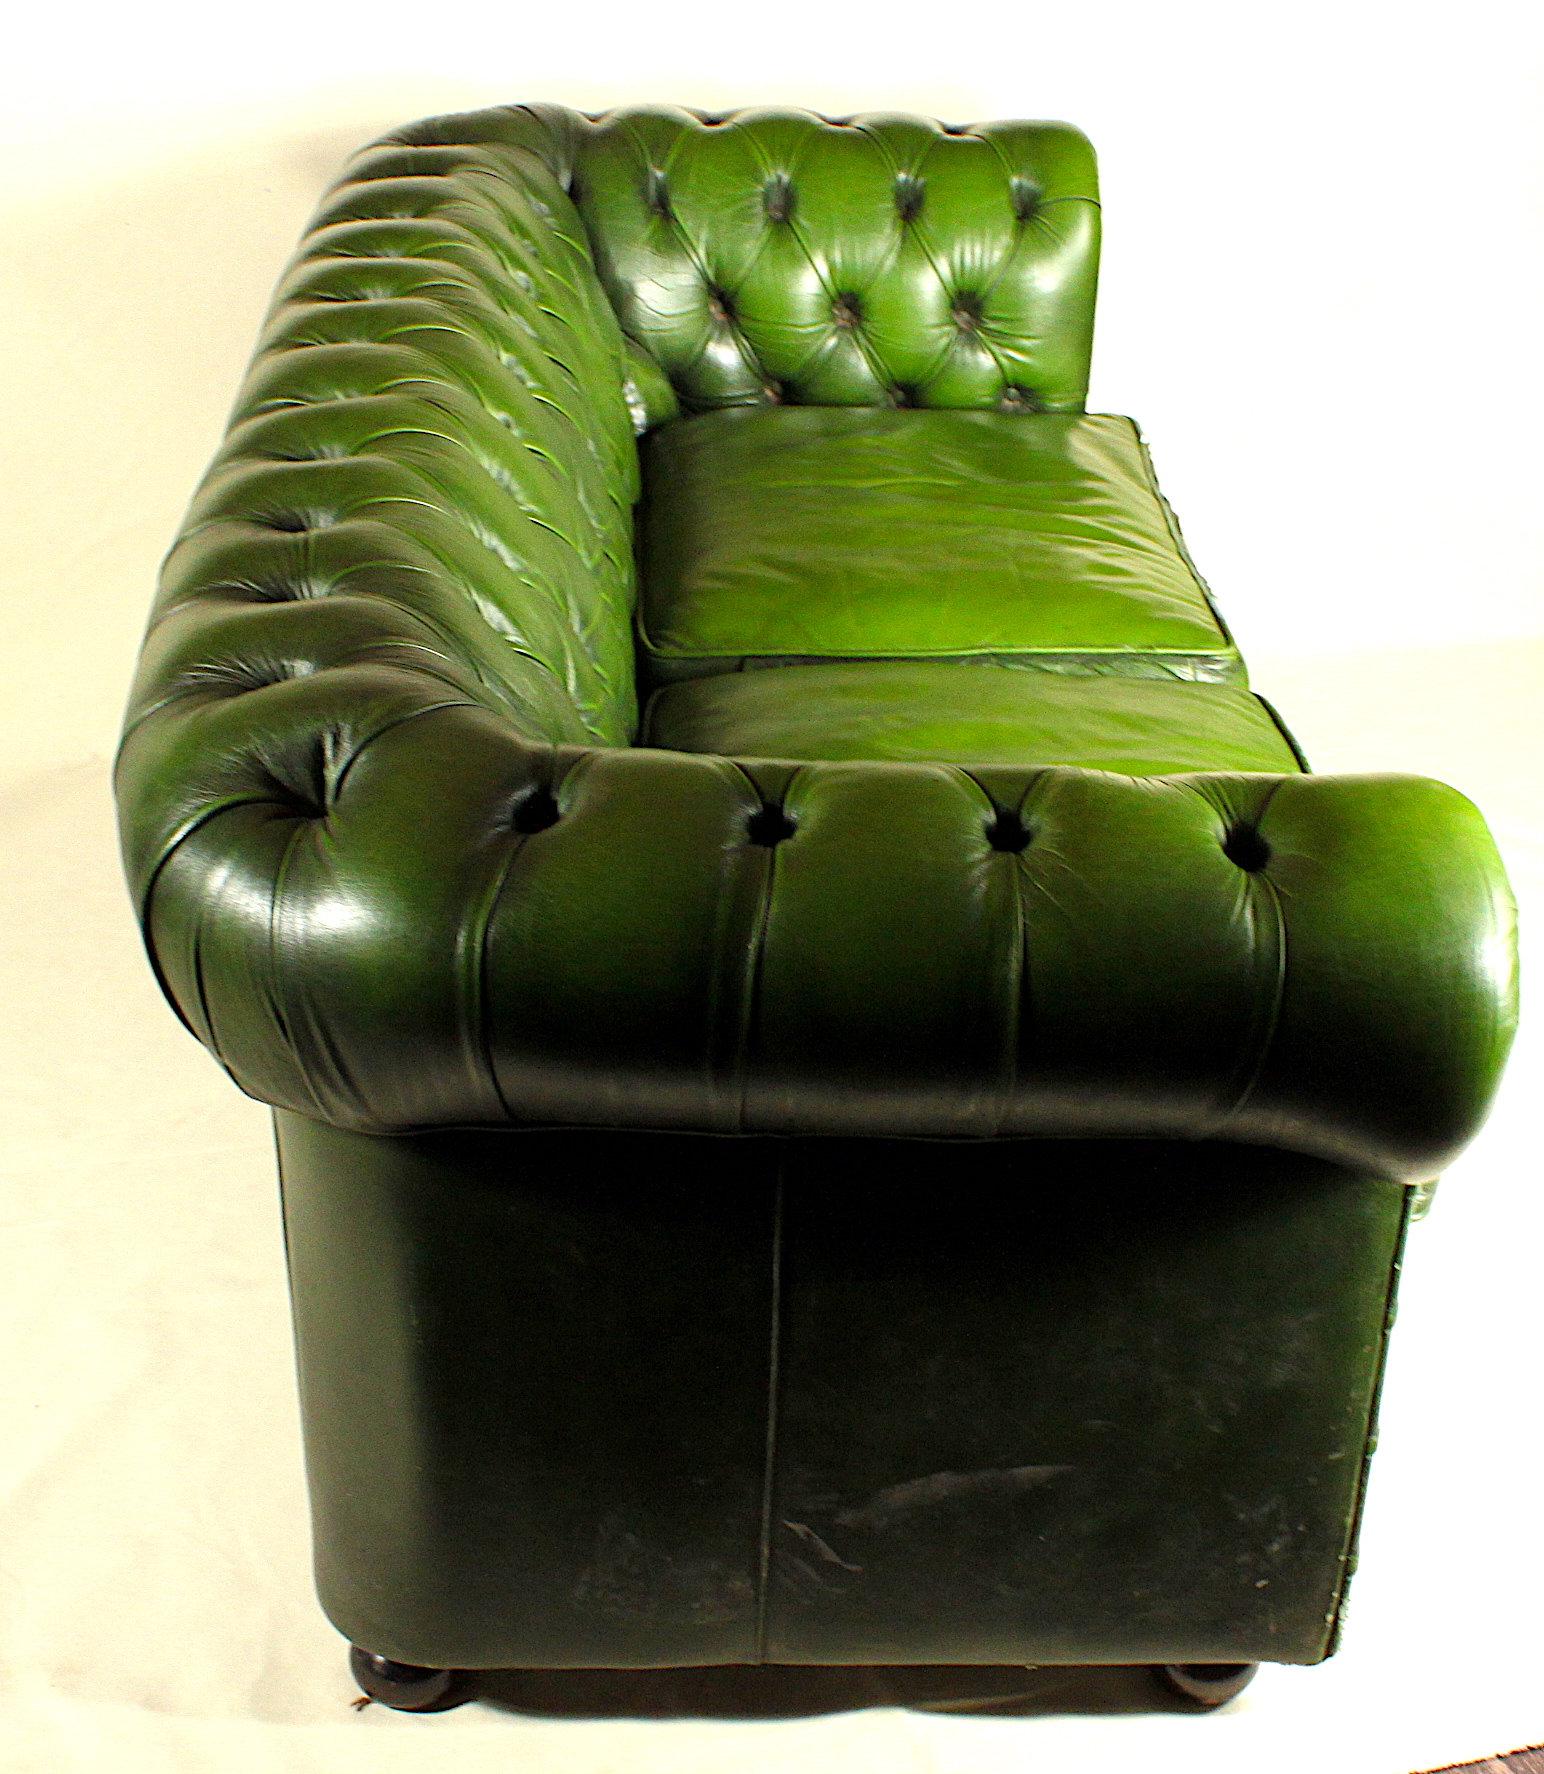 GREEN CHESTERFIELD SOFA | stellar-vintage